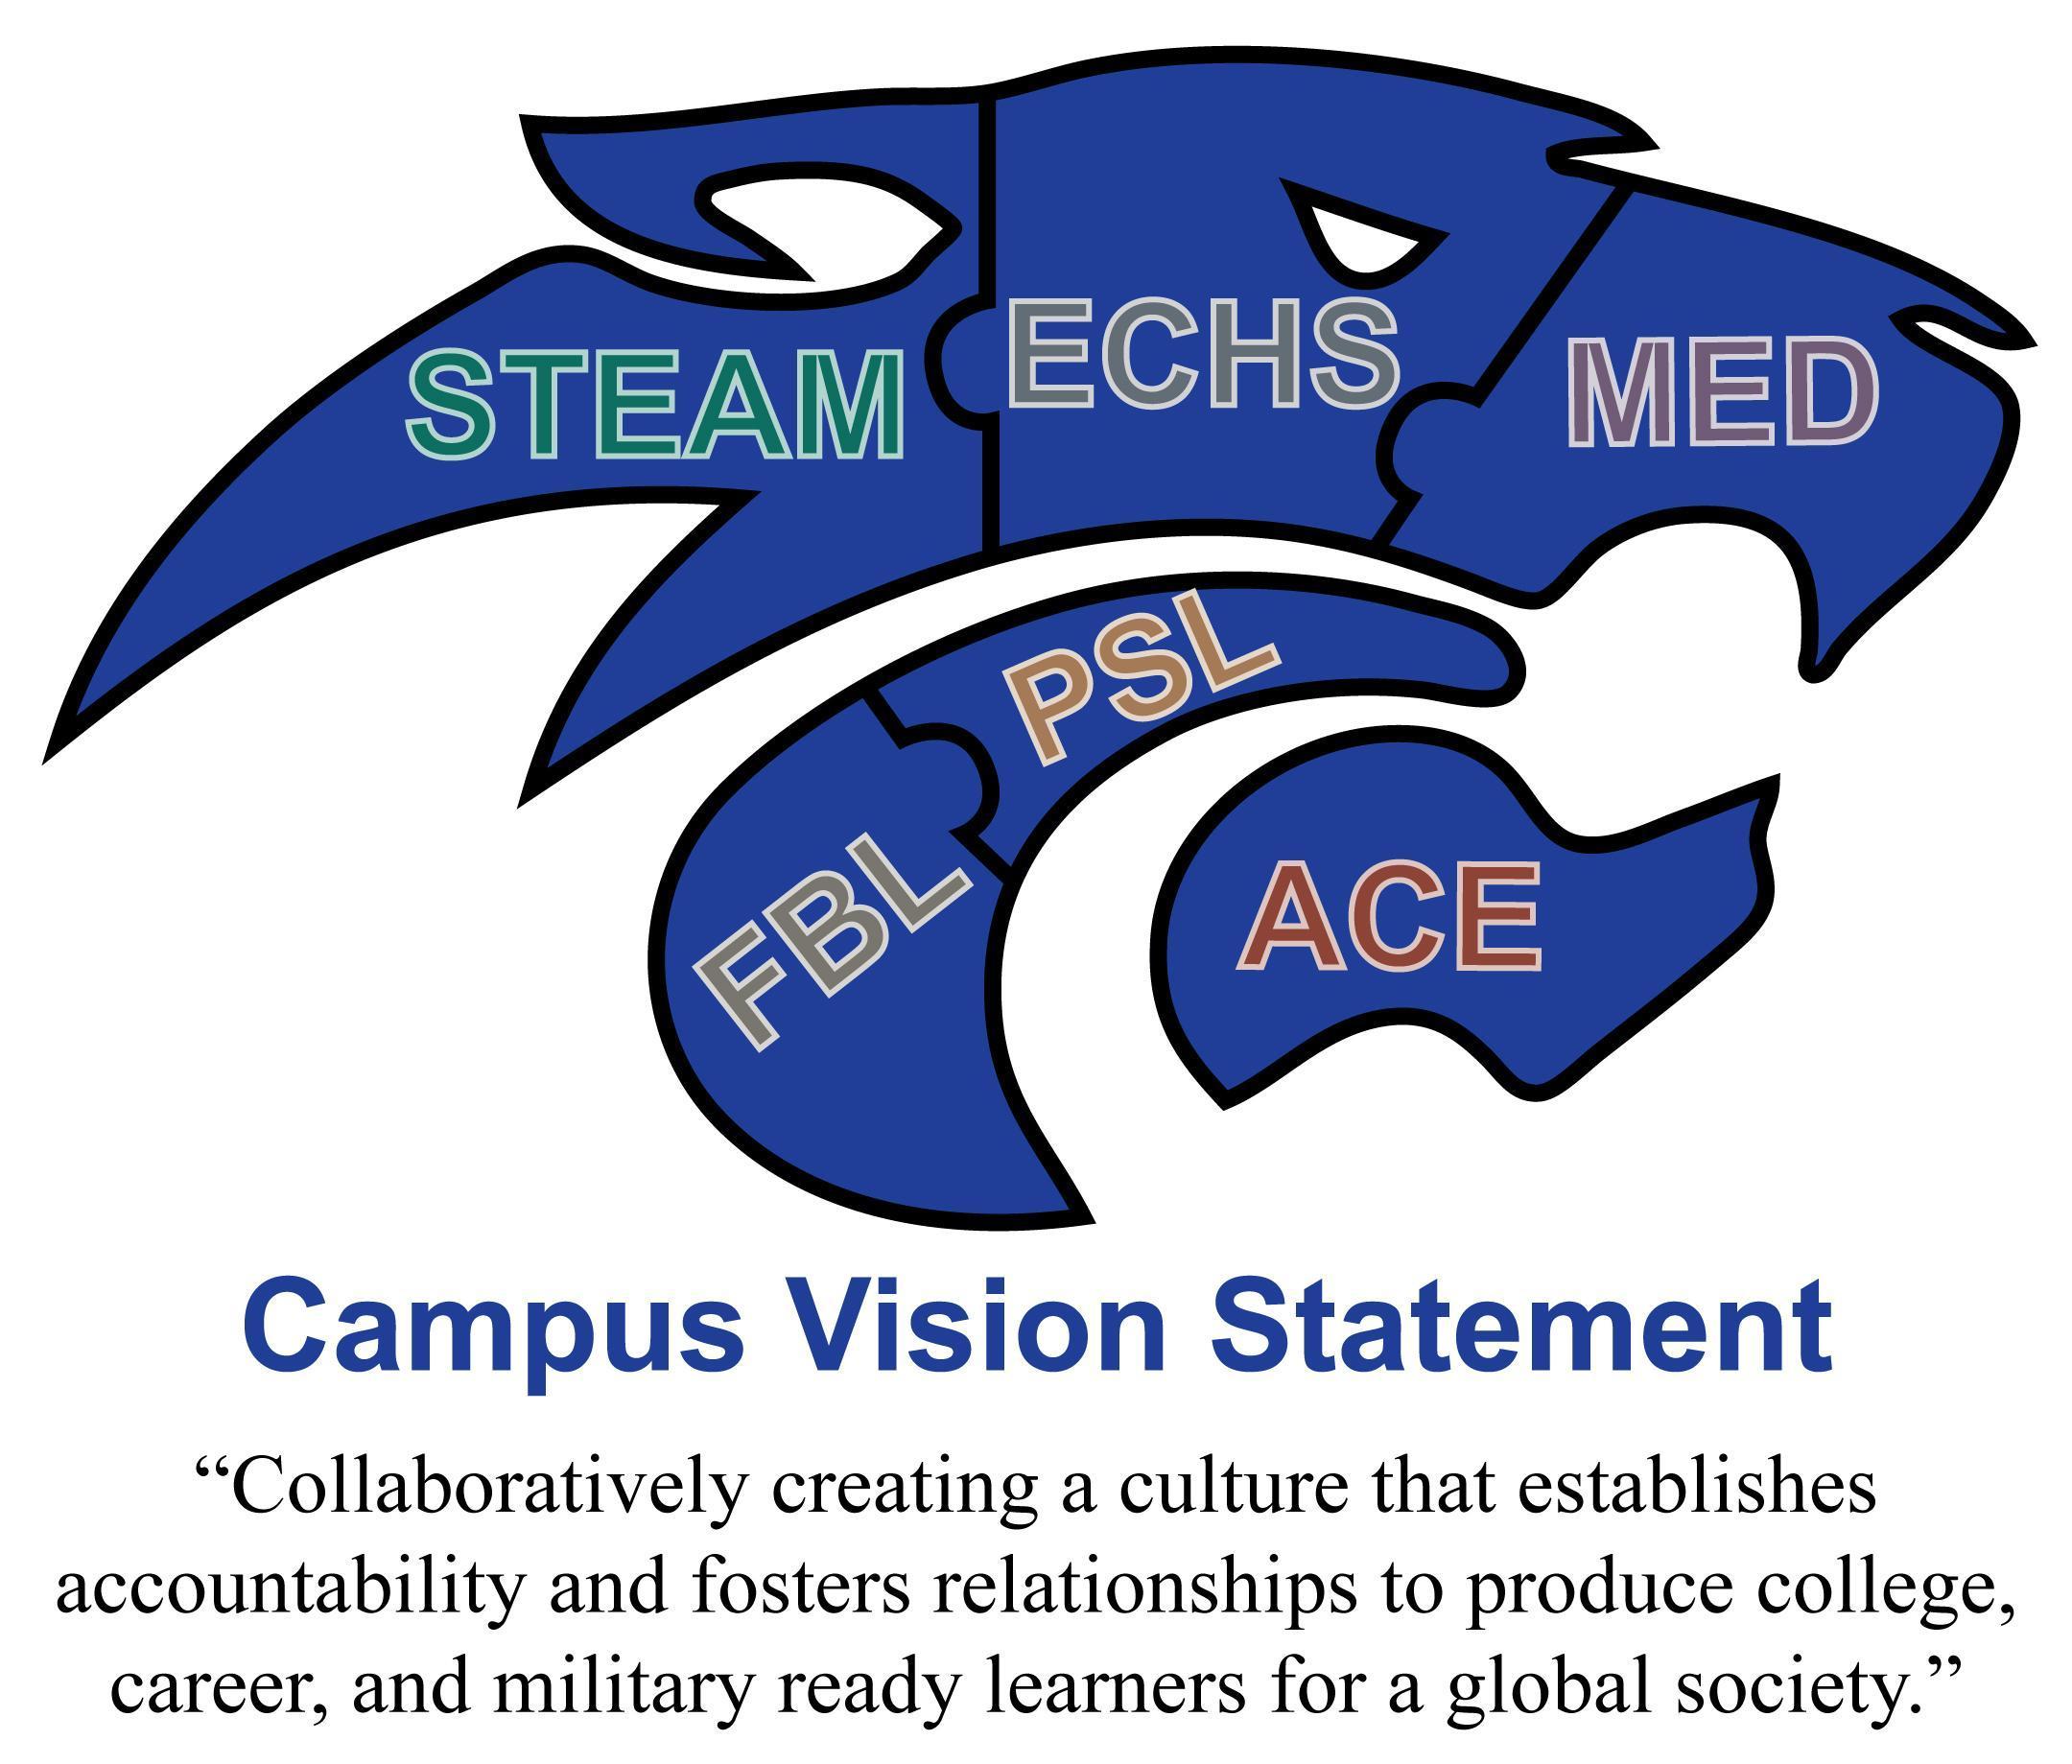 Campus Vision Statement